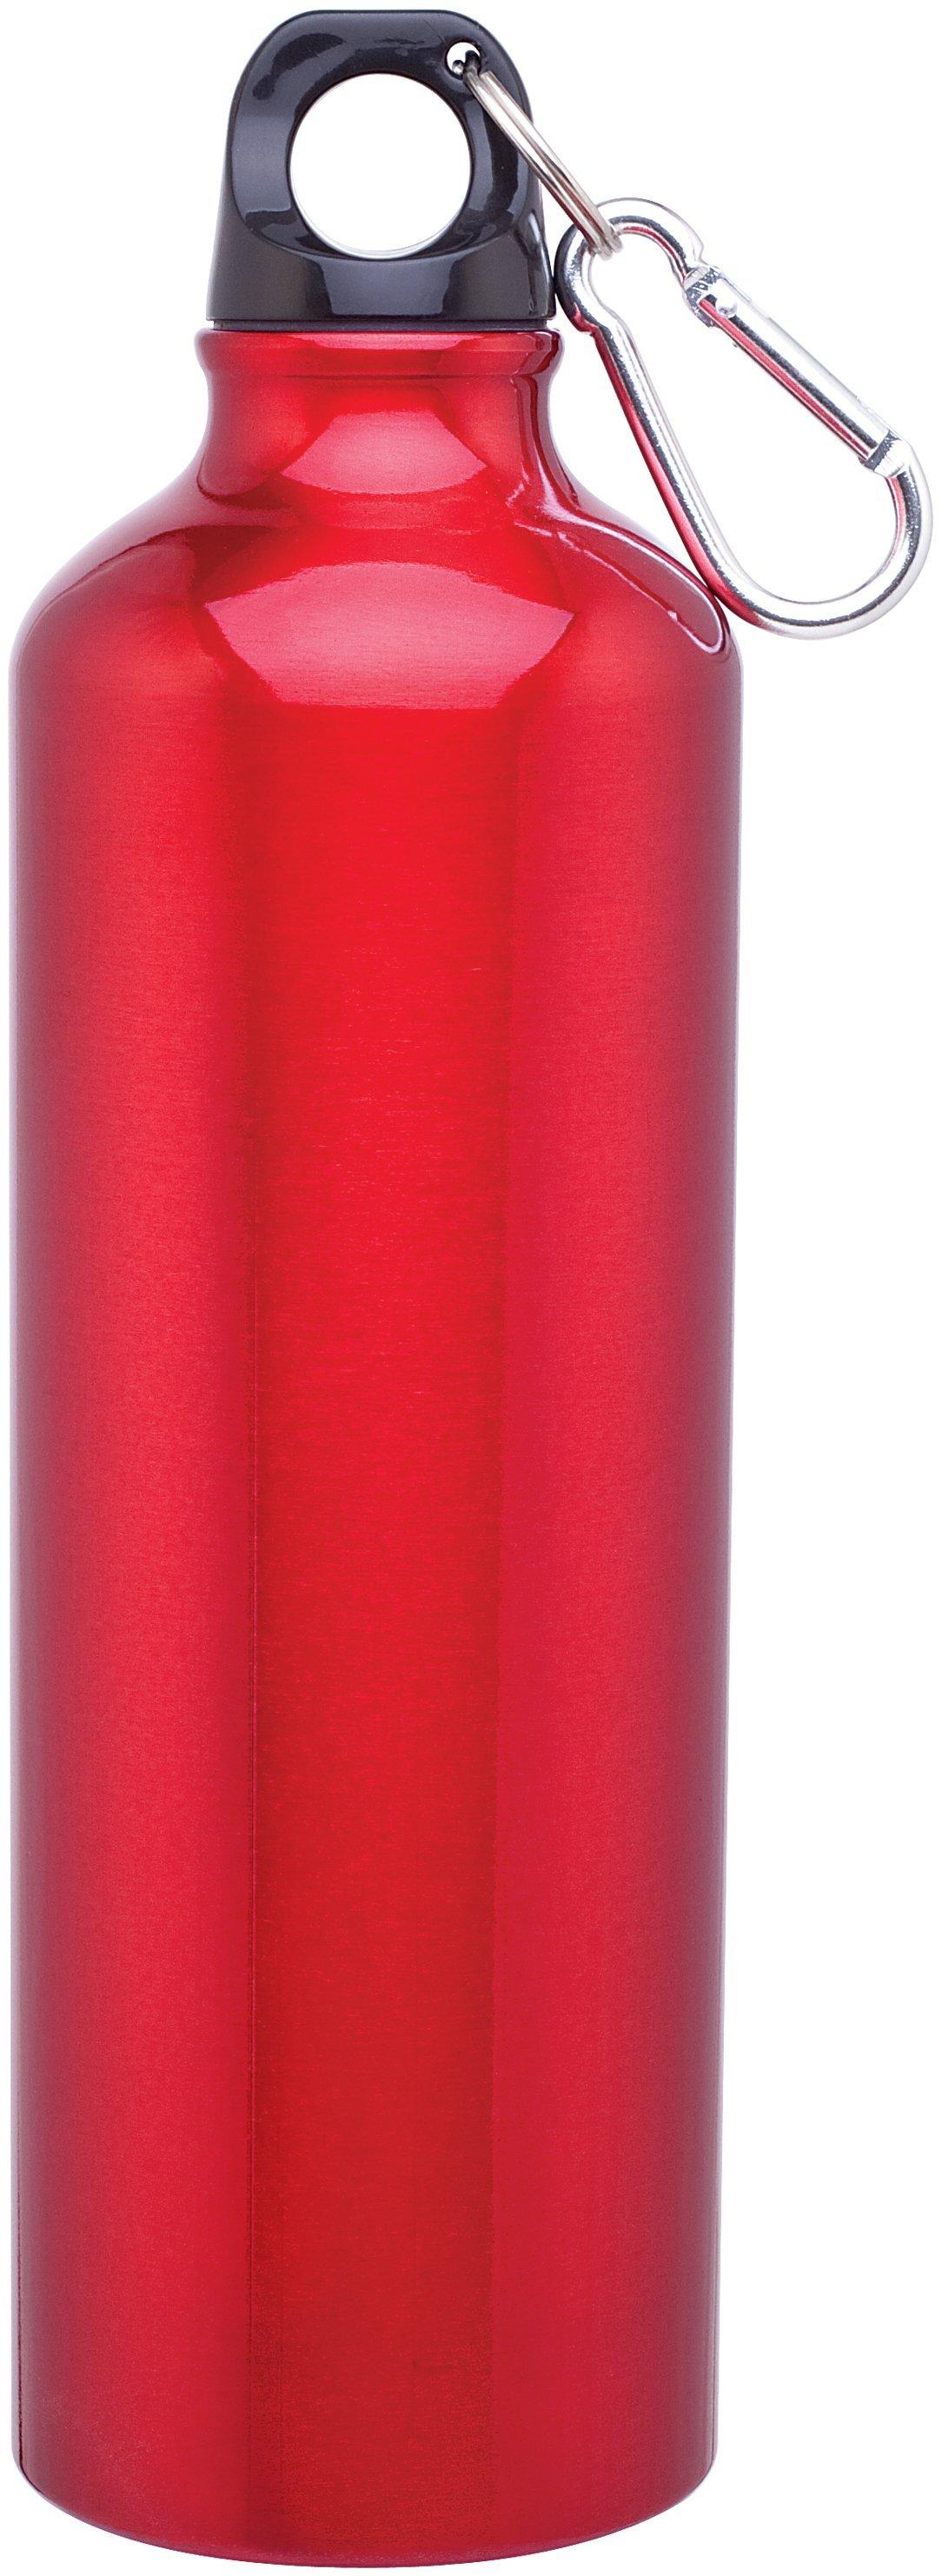 Aluminum Sport Bottle w/ Carabiner, 24oz. - Free Set Up Charges!